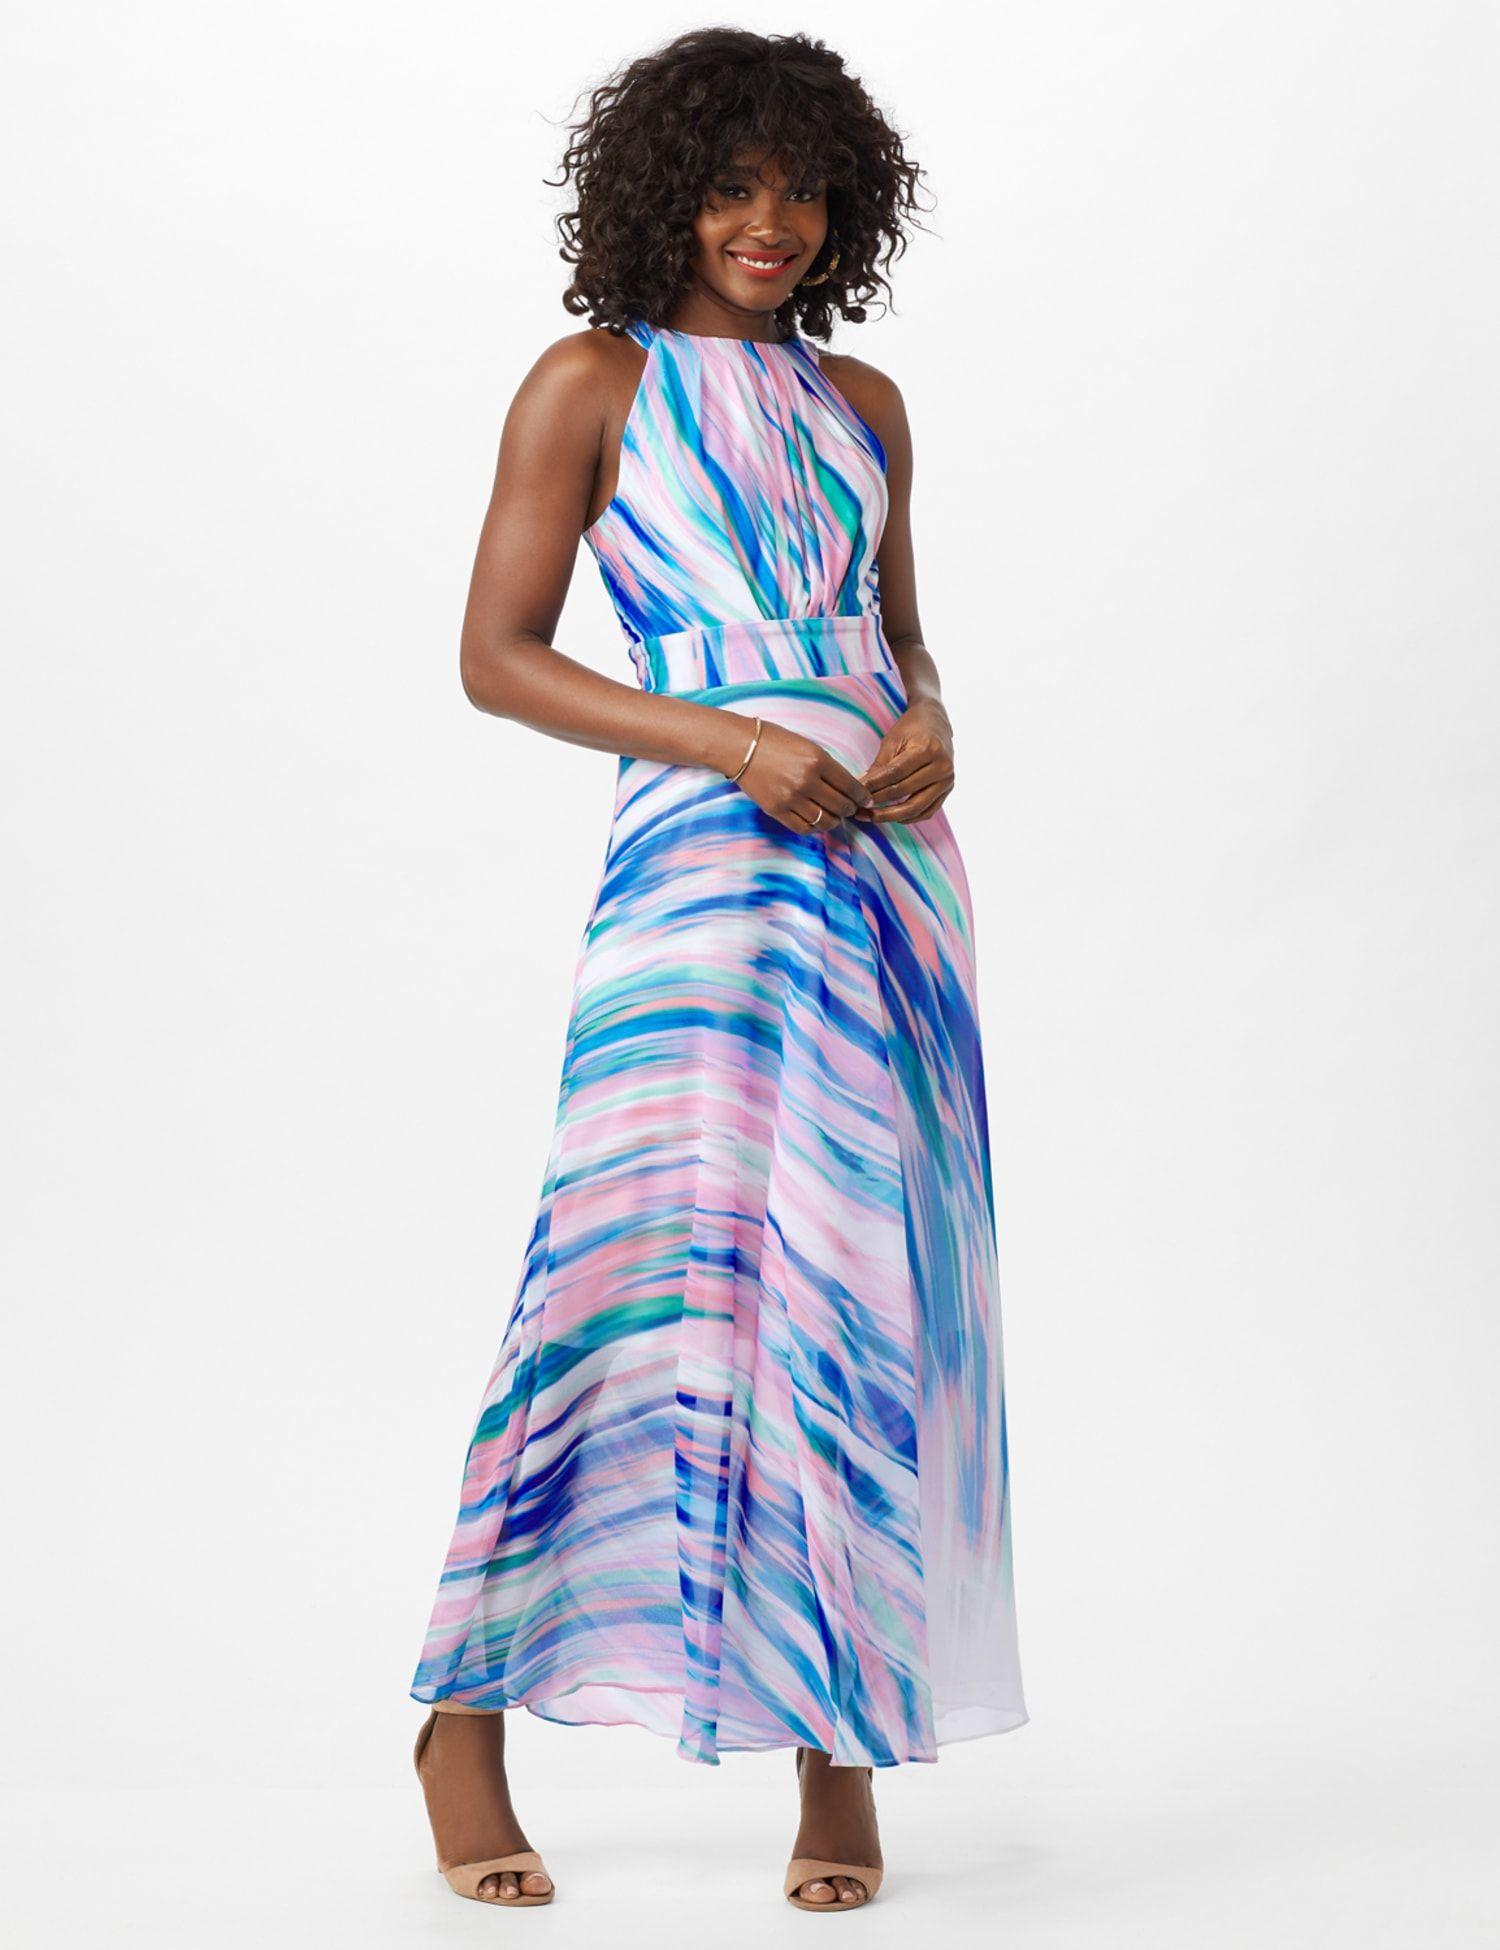 Watercolor Swirl Print Patio Dress Patio Dress Dresses Maxi Dress [ 1950 x 1500 Pixel ]